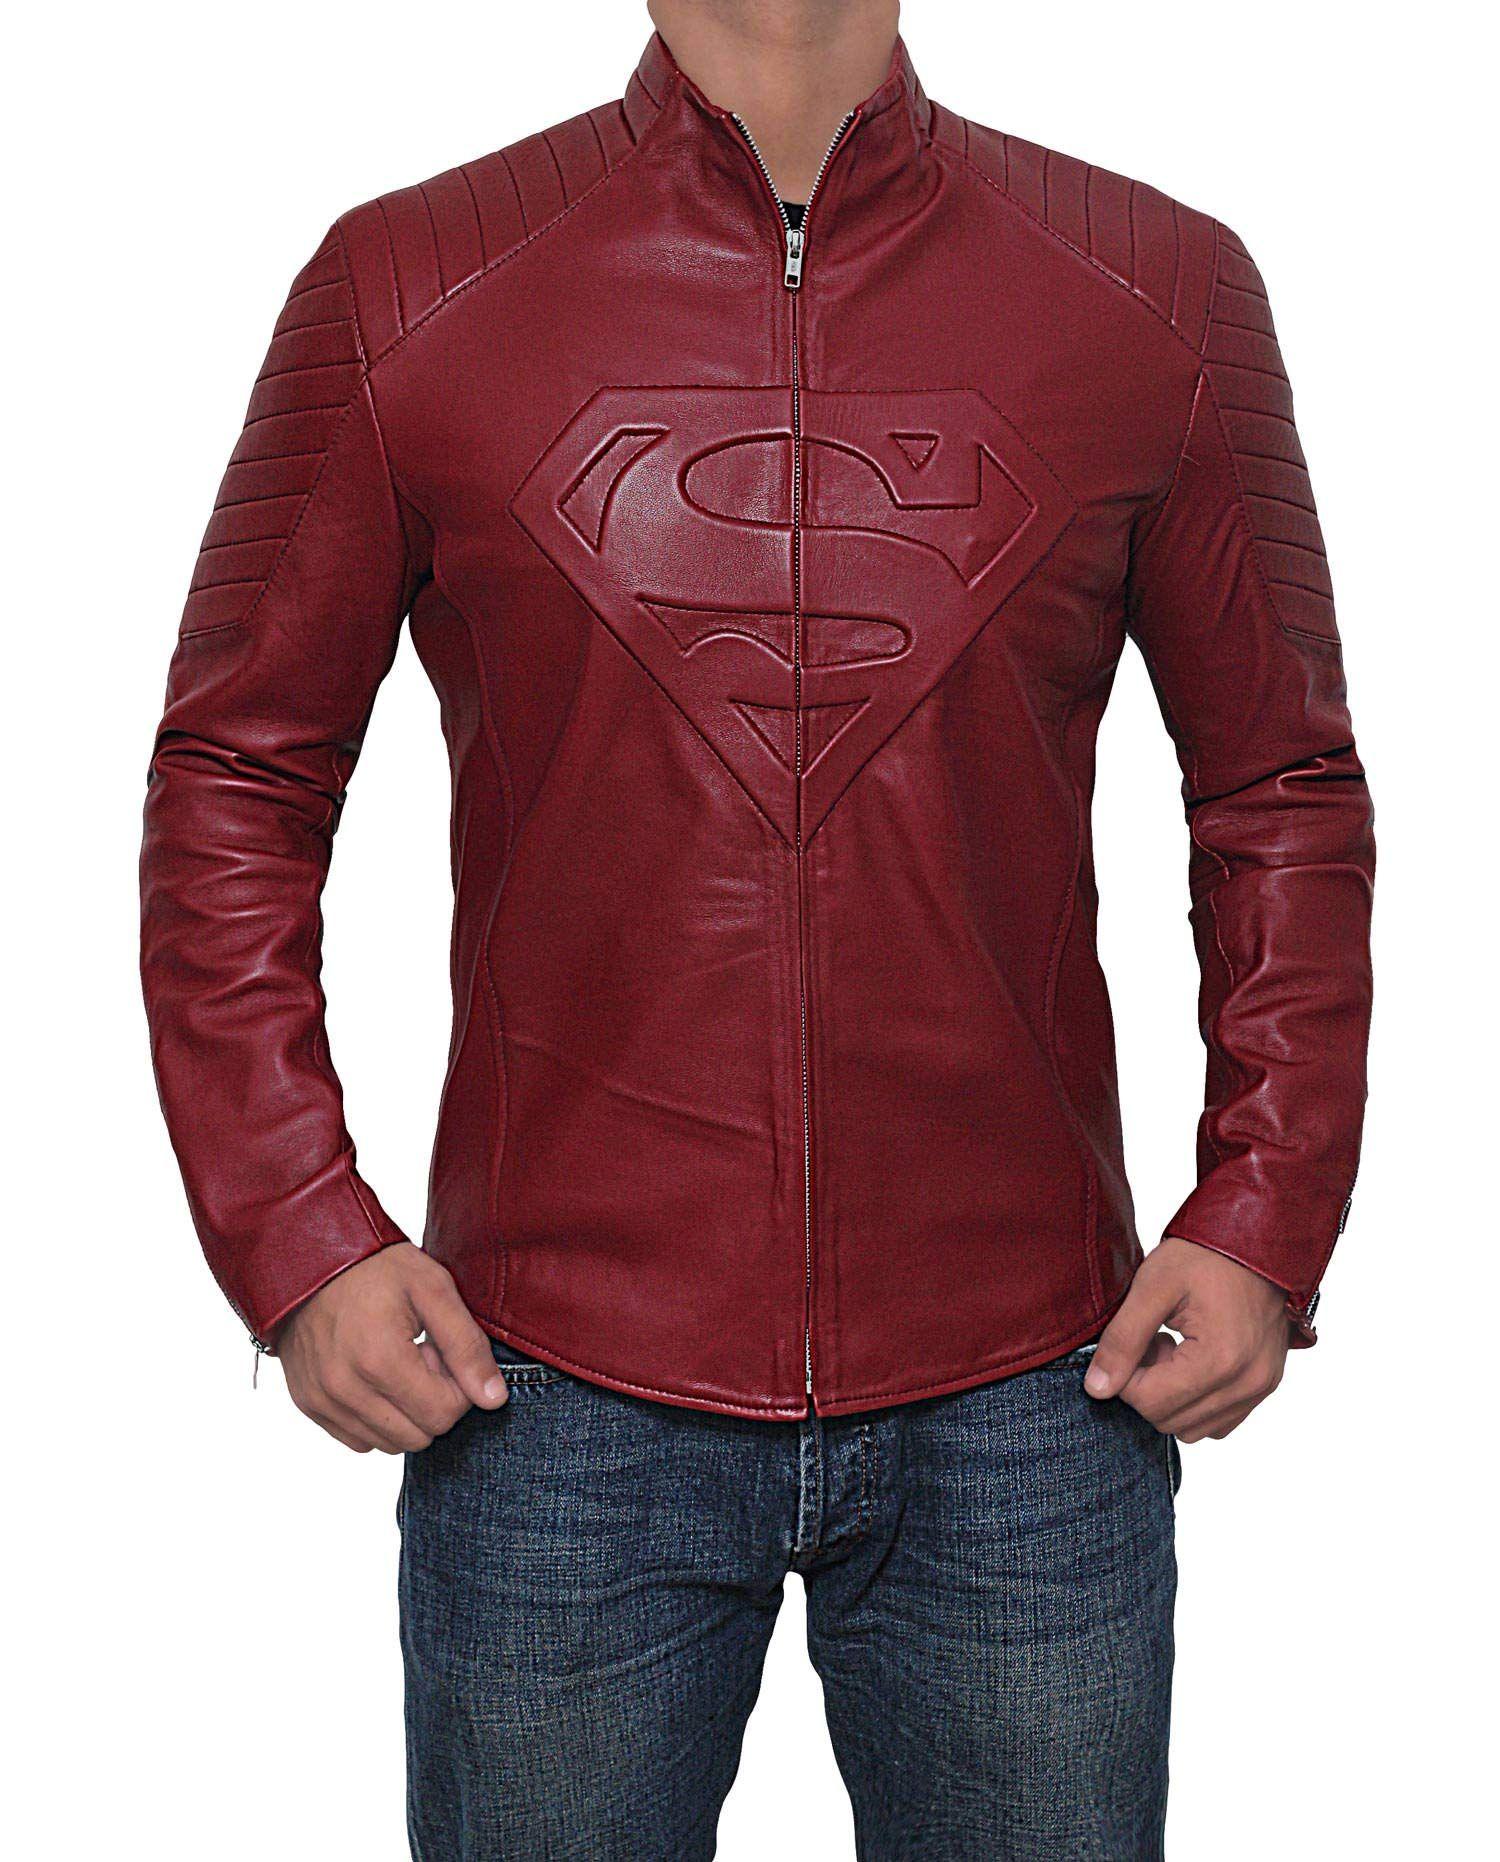 Superman Leather Jacket for Men Superhero Red Leather Logo